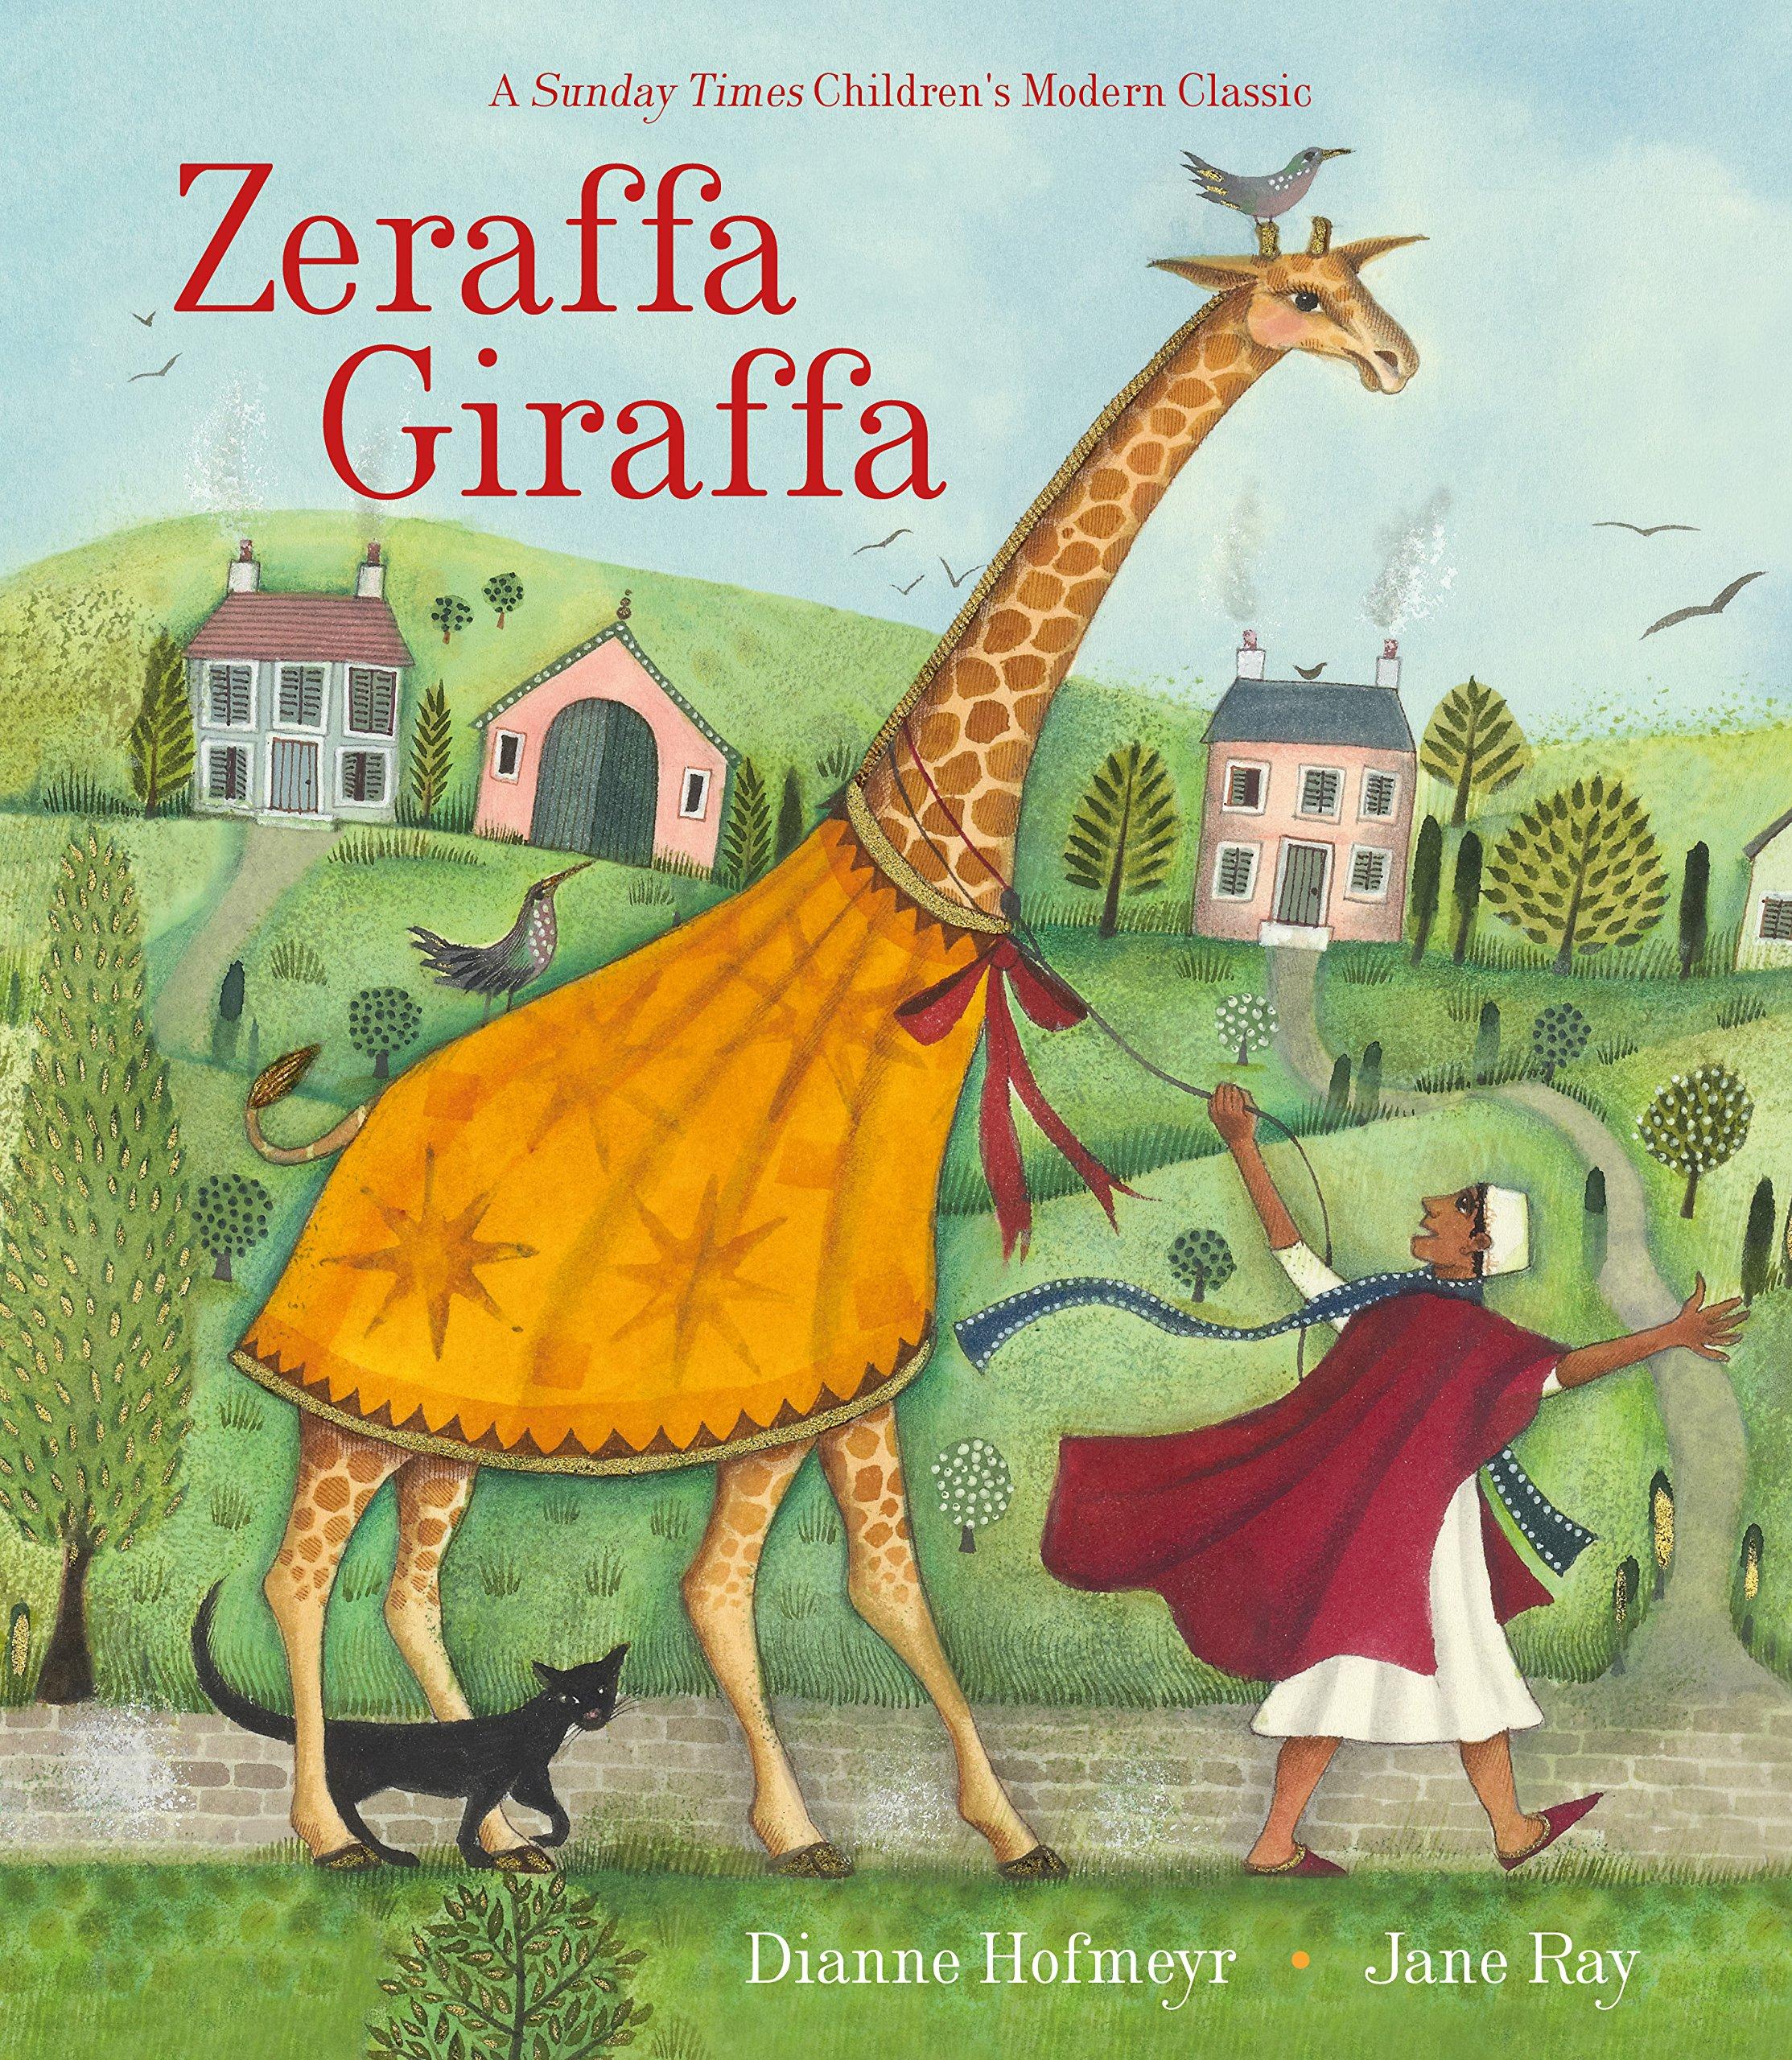 Zeraffa Giraffa: Amazon.co.uk: Dianne Hofmeyr, Jane Ray ...